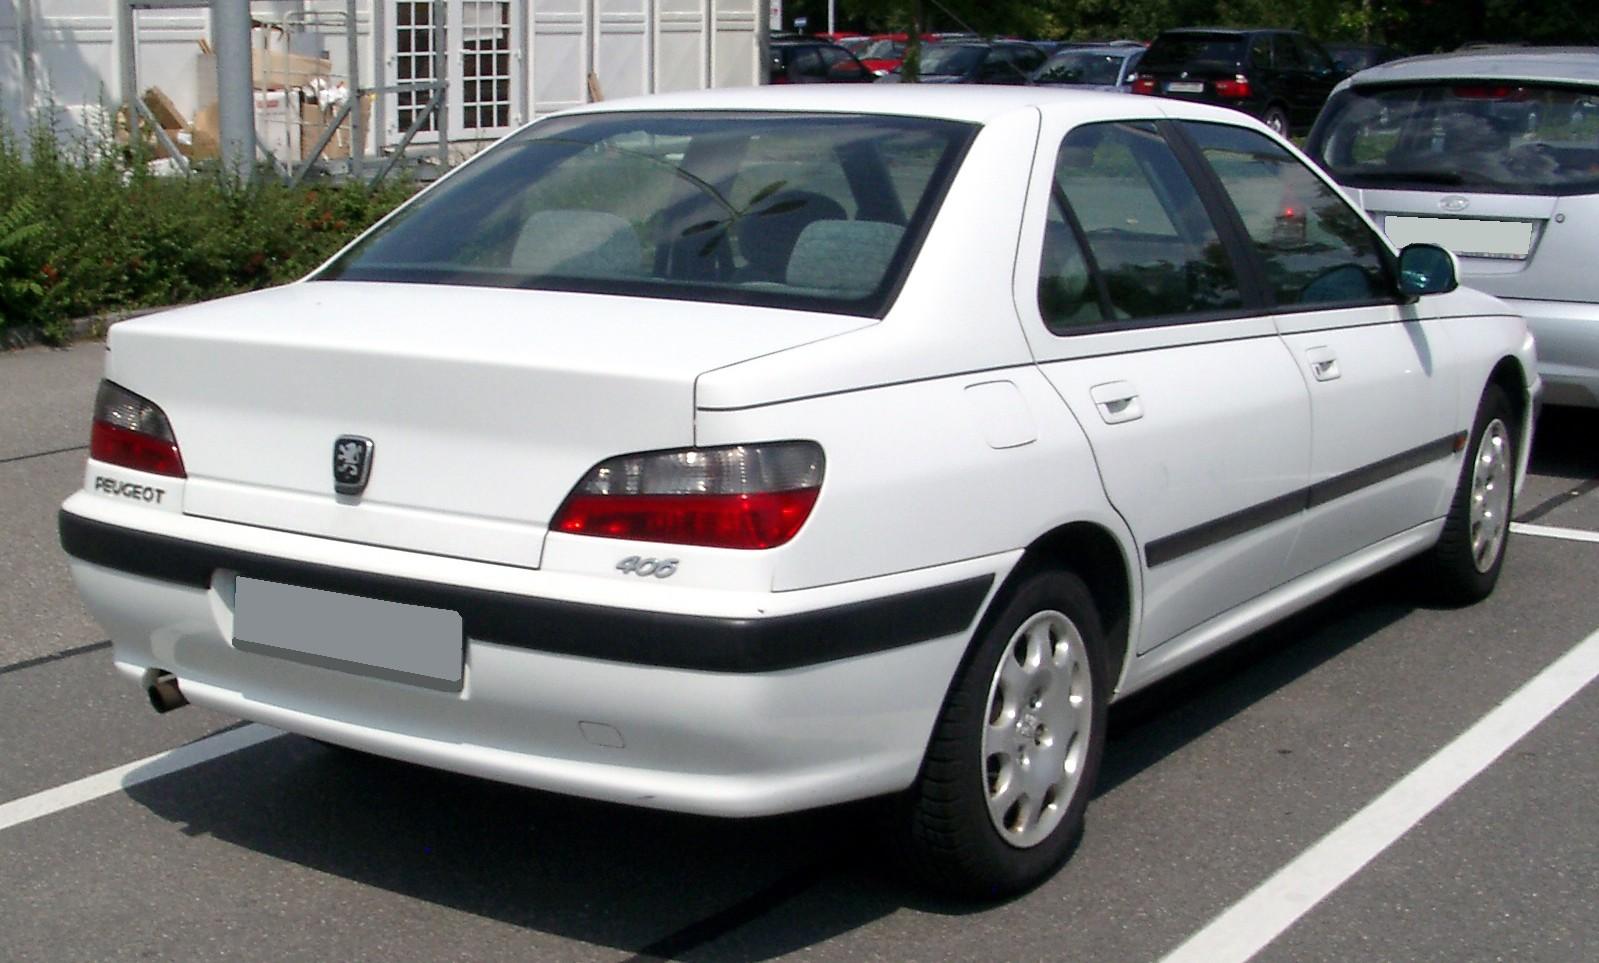 File:Peugeot 406 rear 20080730.jpg